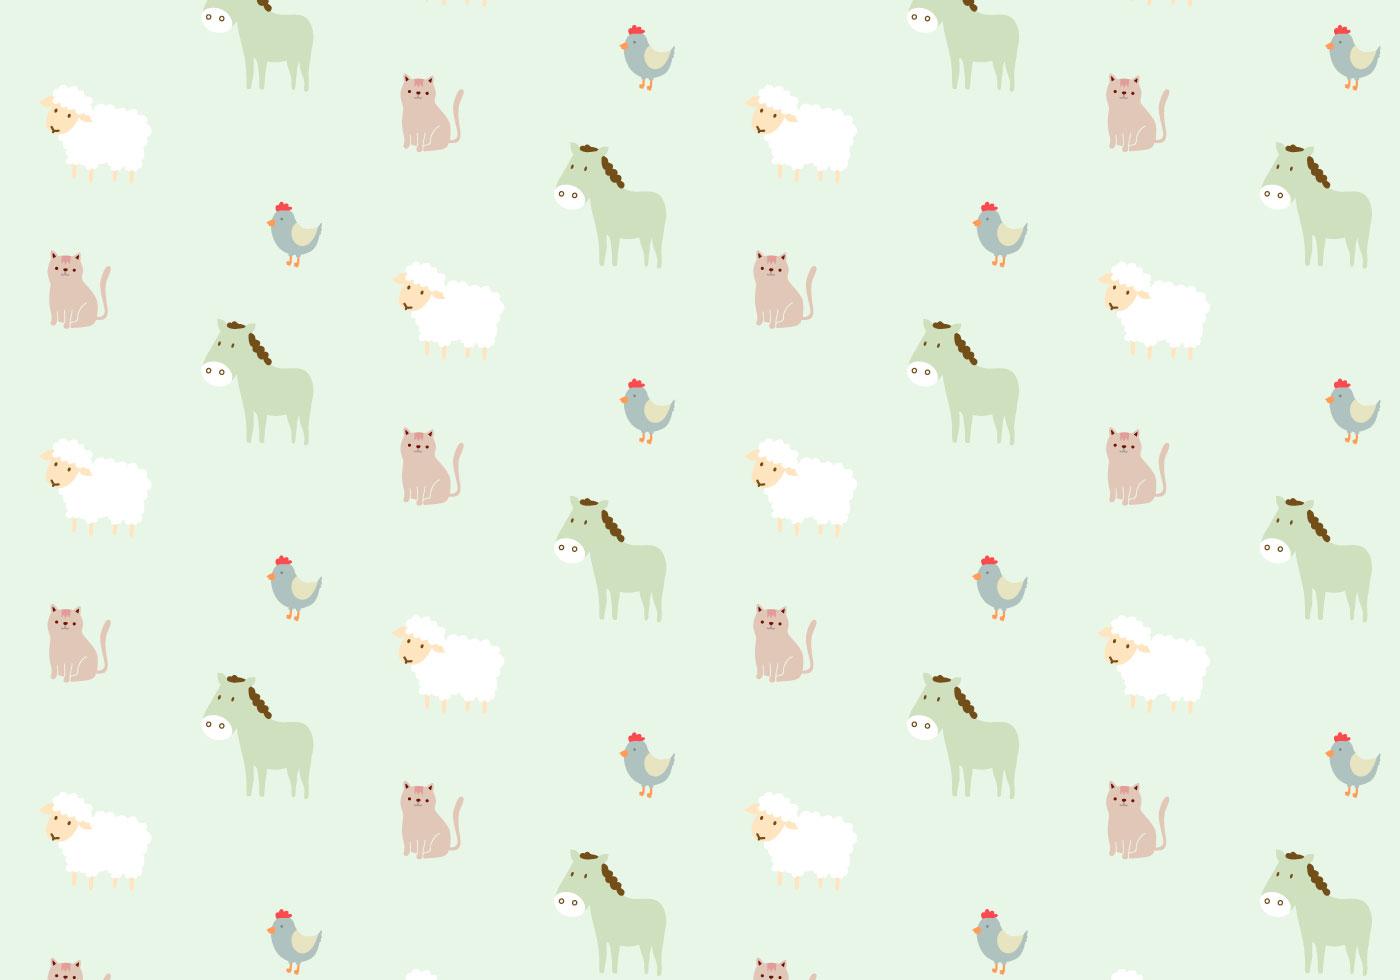 Cute Cartoon Horse Wallpaper Farm Animals Pattern Background Download Free Vector Art